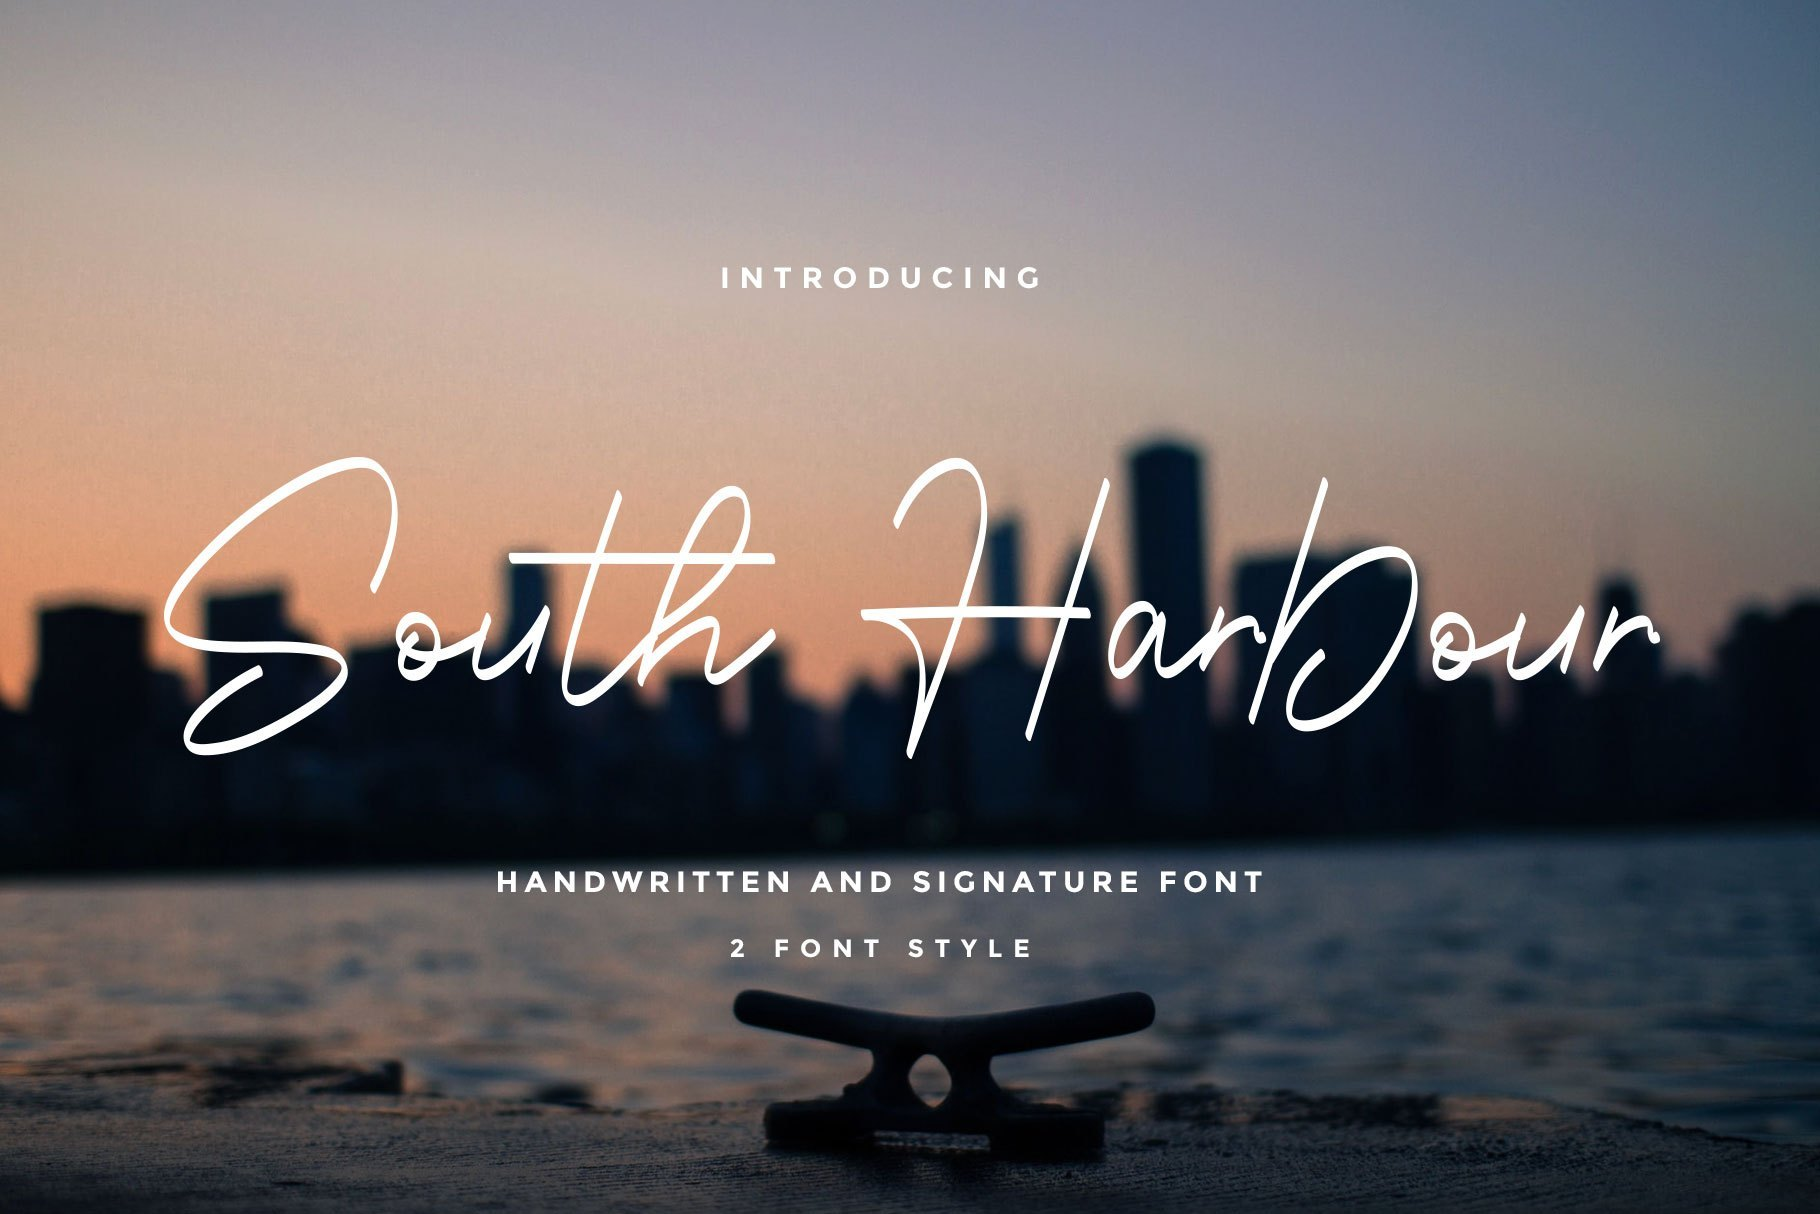 South-Harbour-Monoline-Handwritten-Font